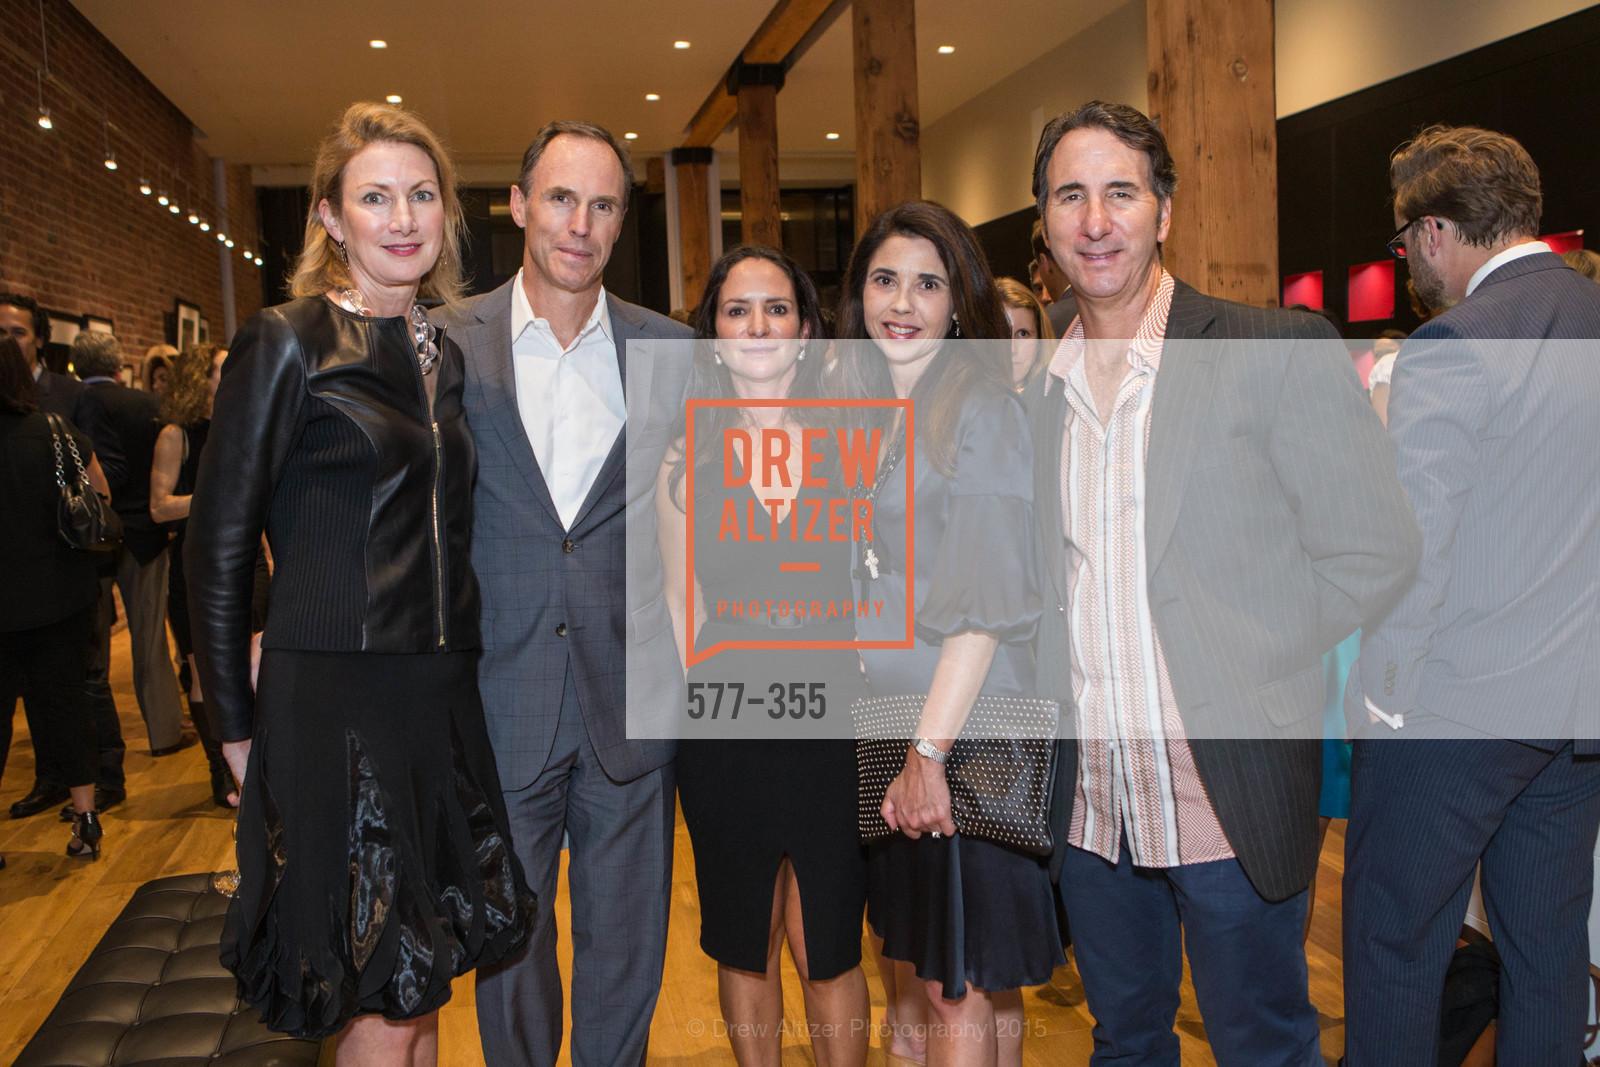 Courtney Dallaire, Candace Cavanaugh, Mario Rodighiero, SFMOMA Contemporary Vision Award Launch Party, Leica. 463 Bush St, October 8th, 2015